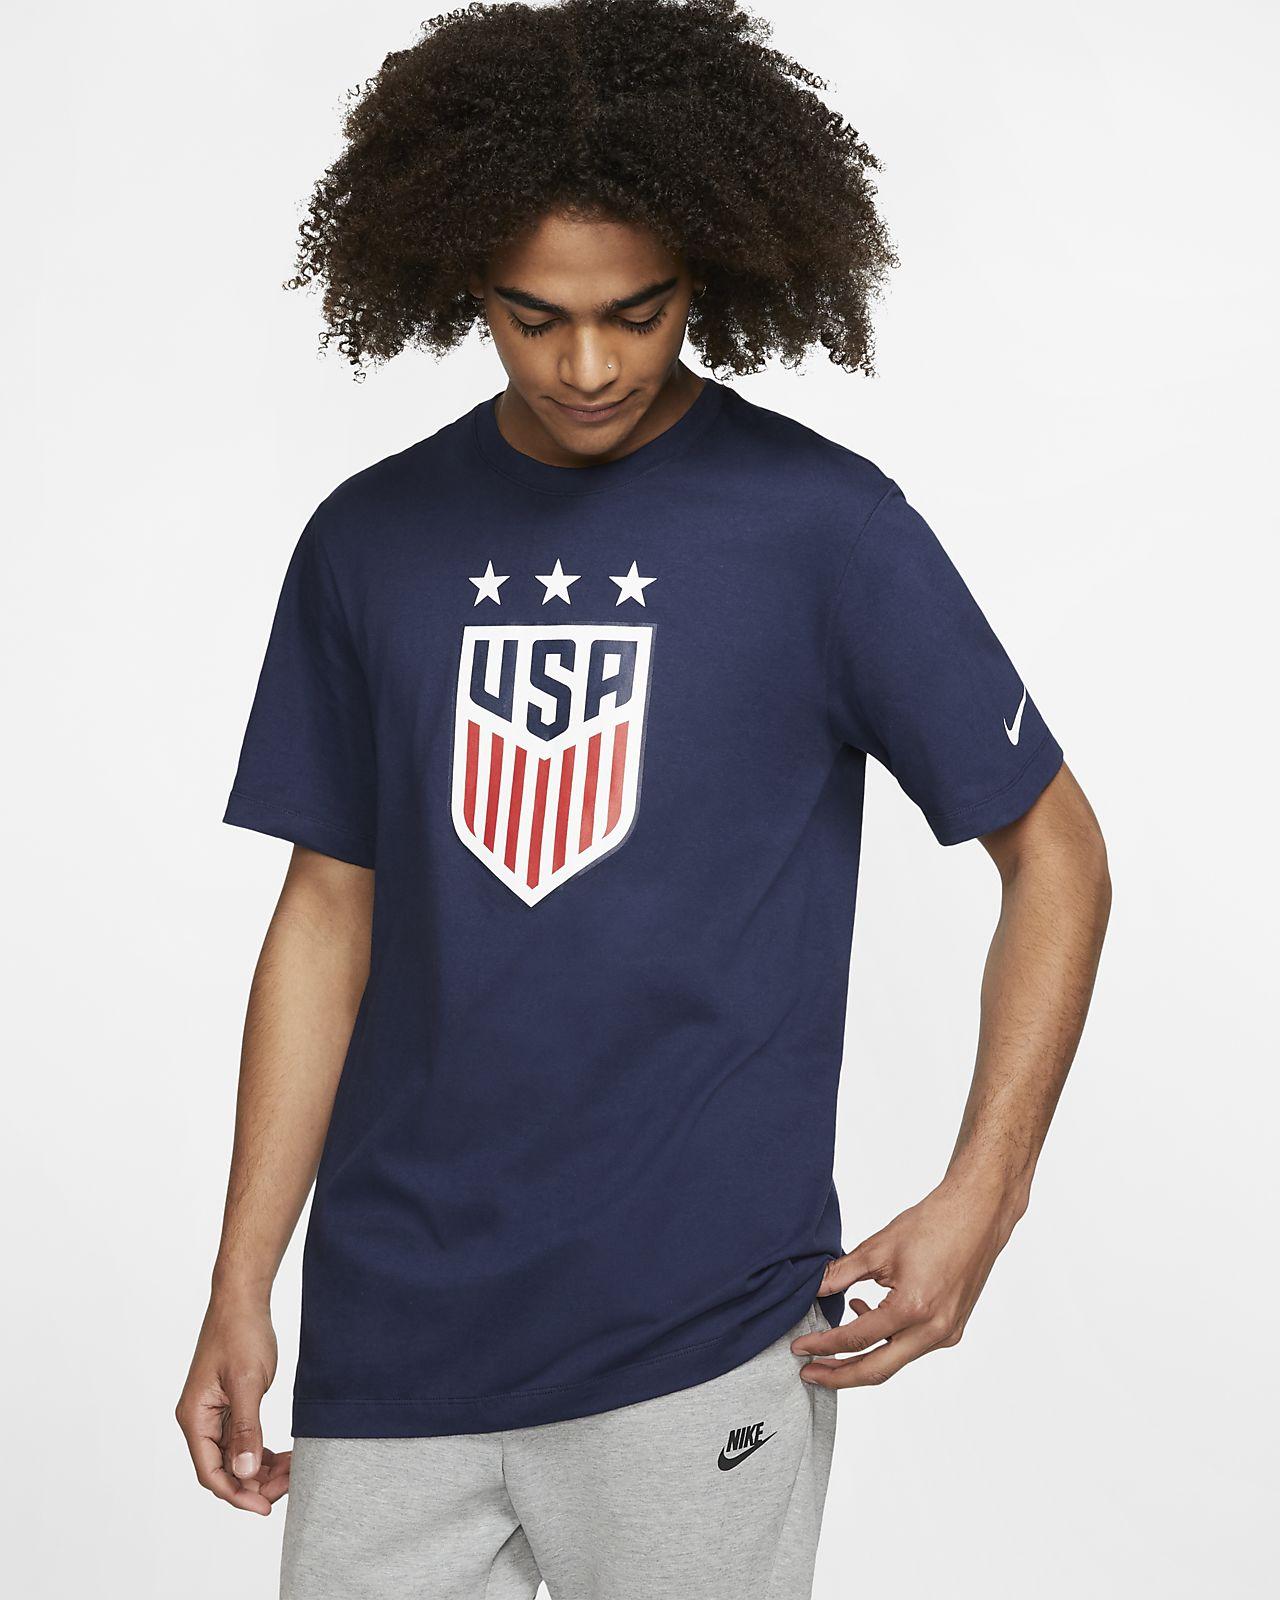 U.S. Soccer Men's T-Shirt